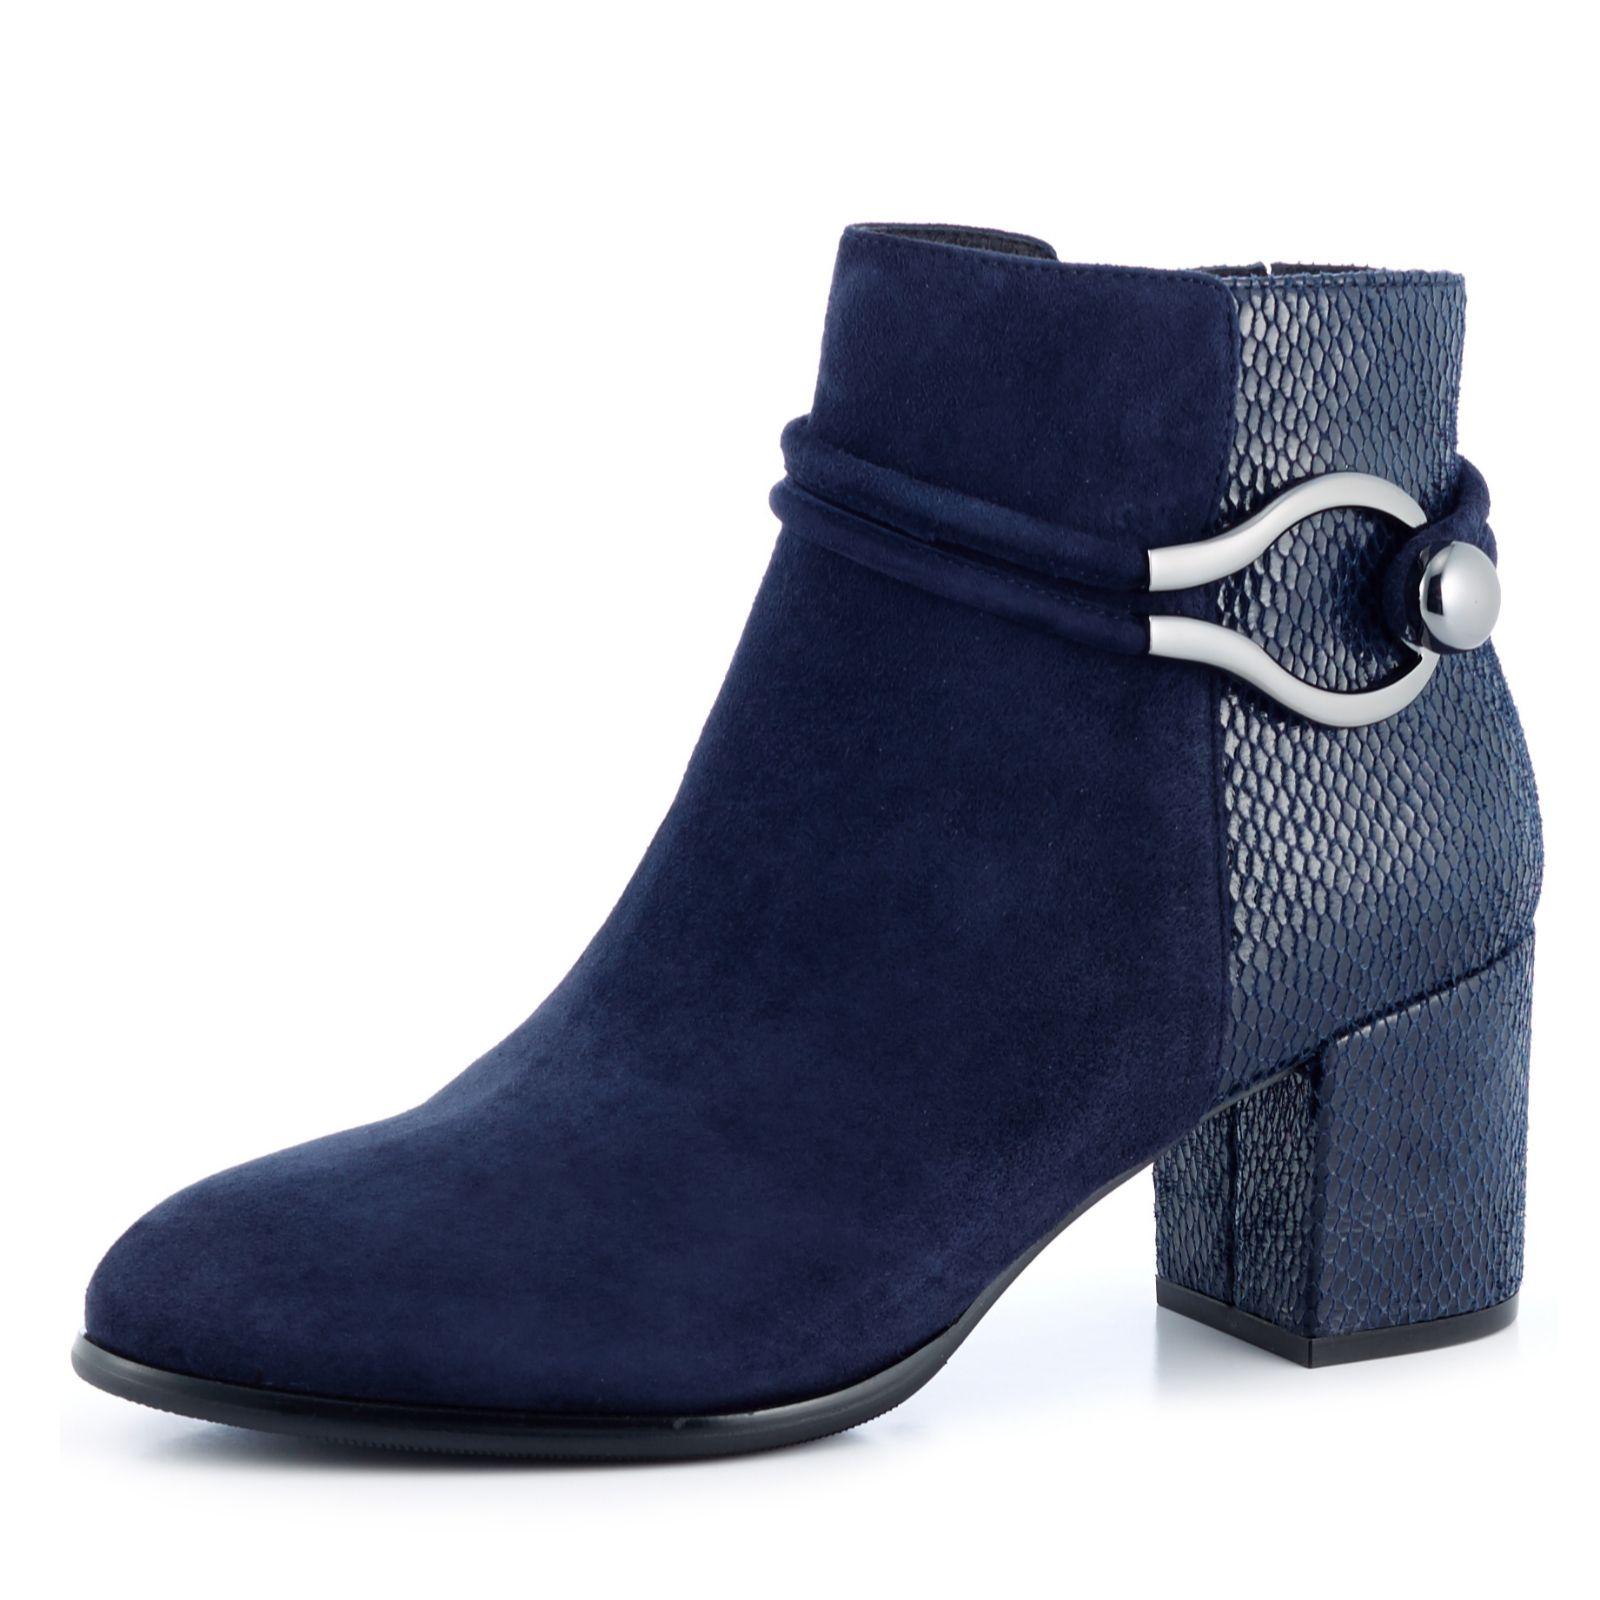 8a2492096 Moda in Pelle Laureena Ankle Boot w/ Metal Trim - QVC UK